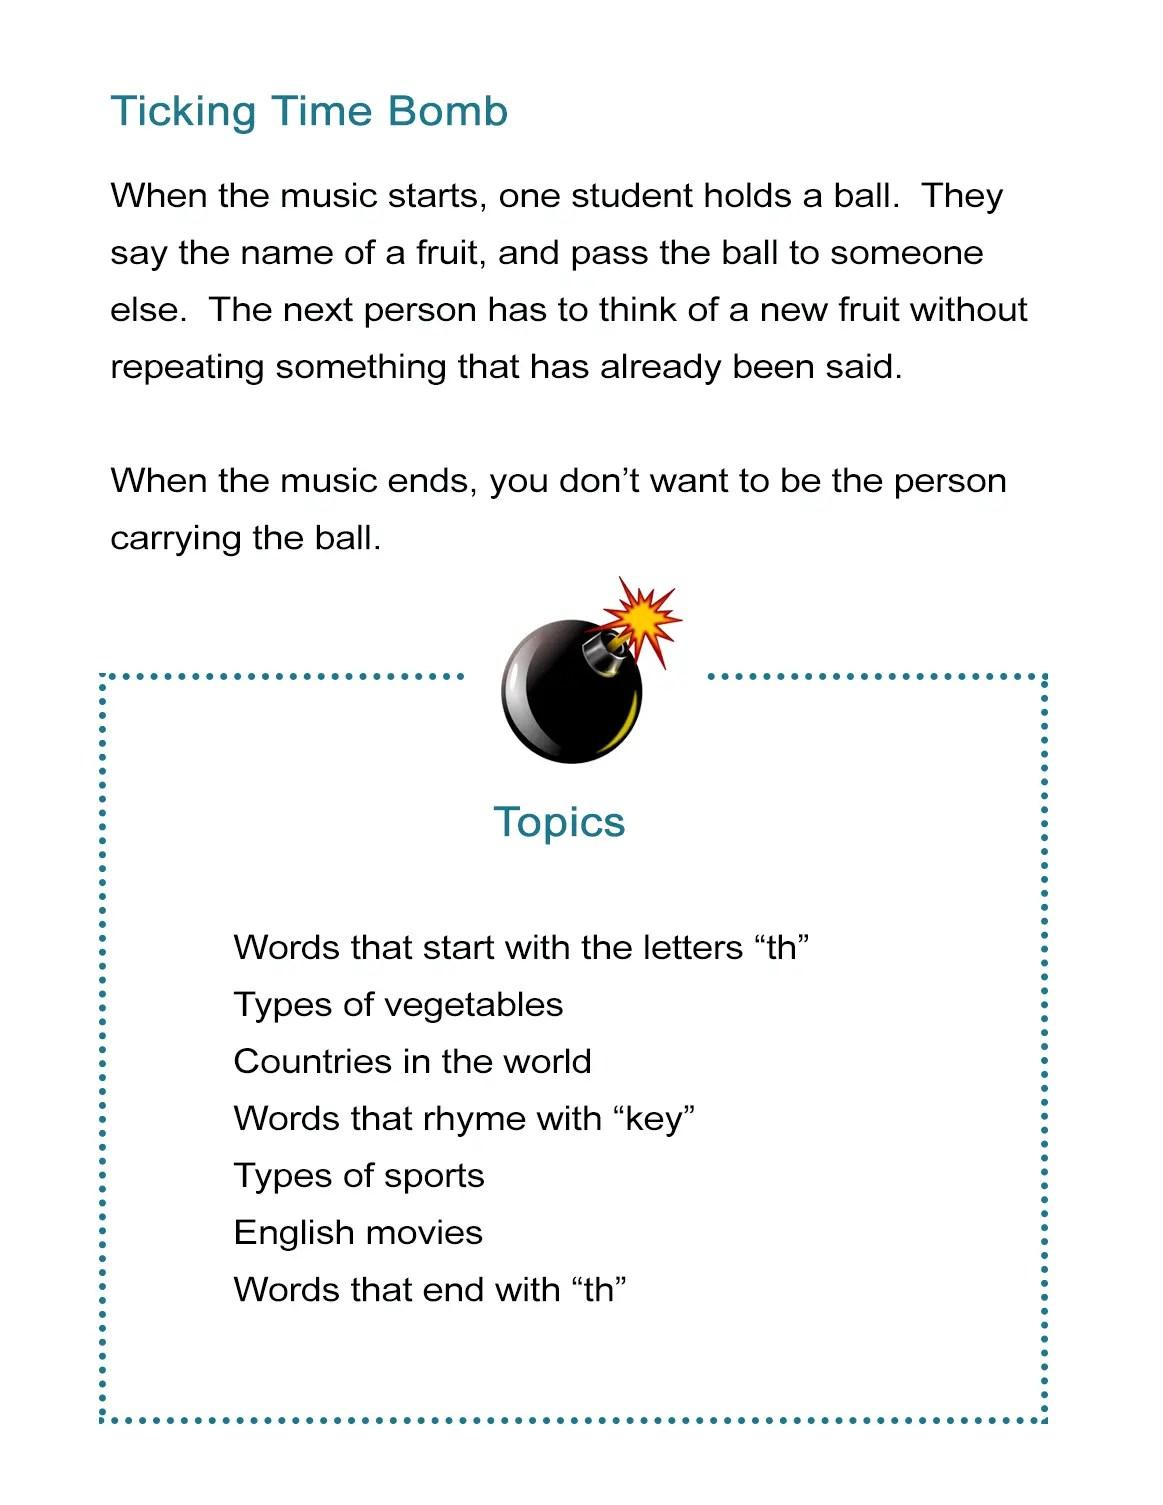 27 Free Esl Games To Teach English Like An All Star